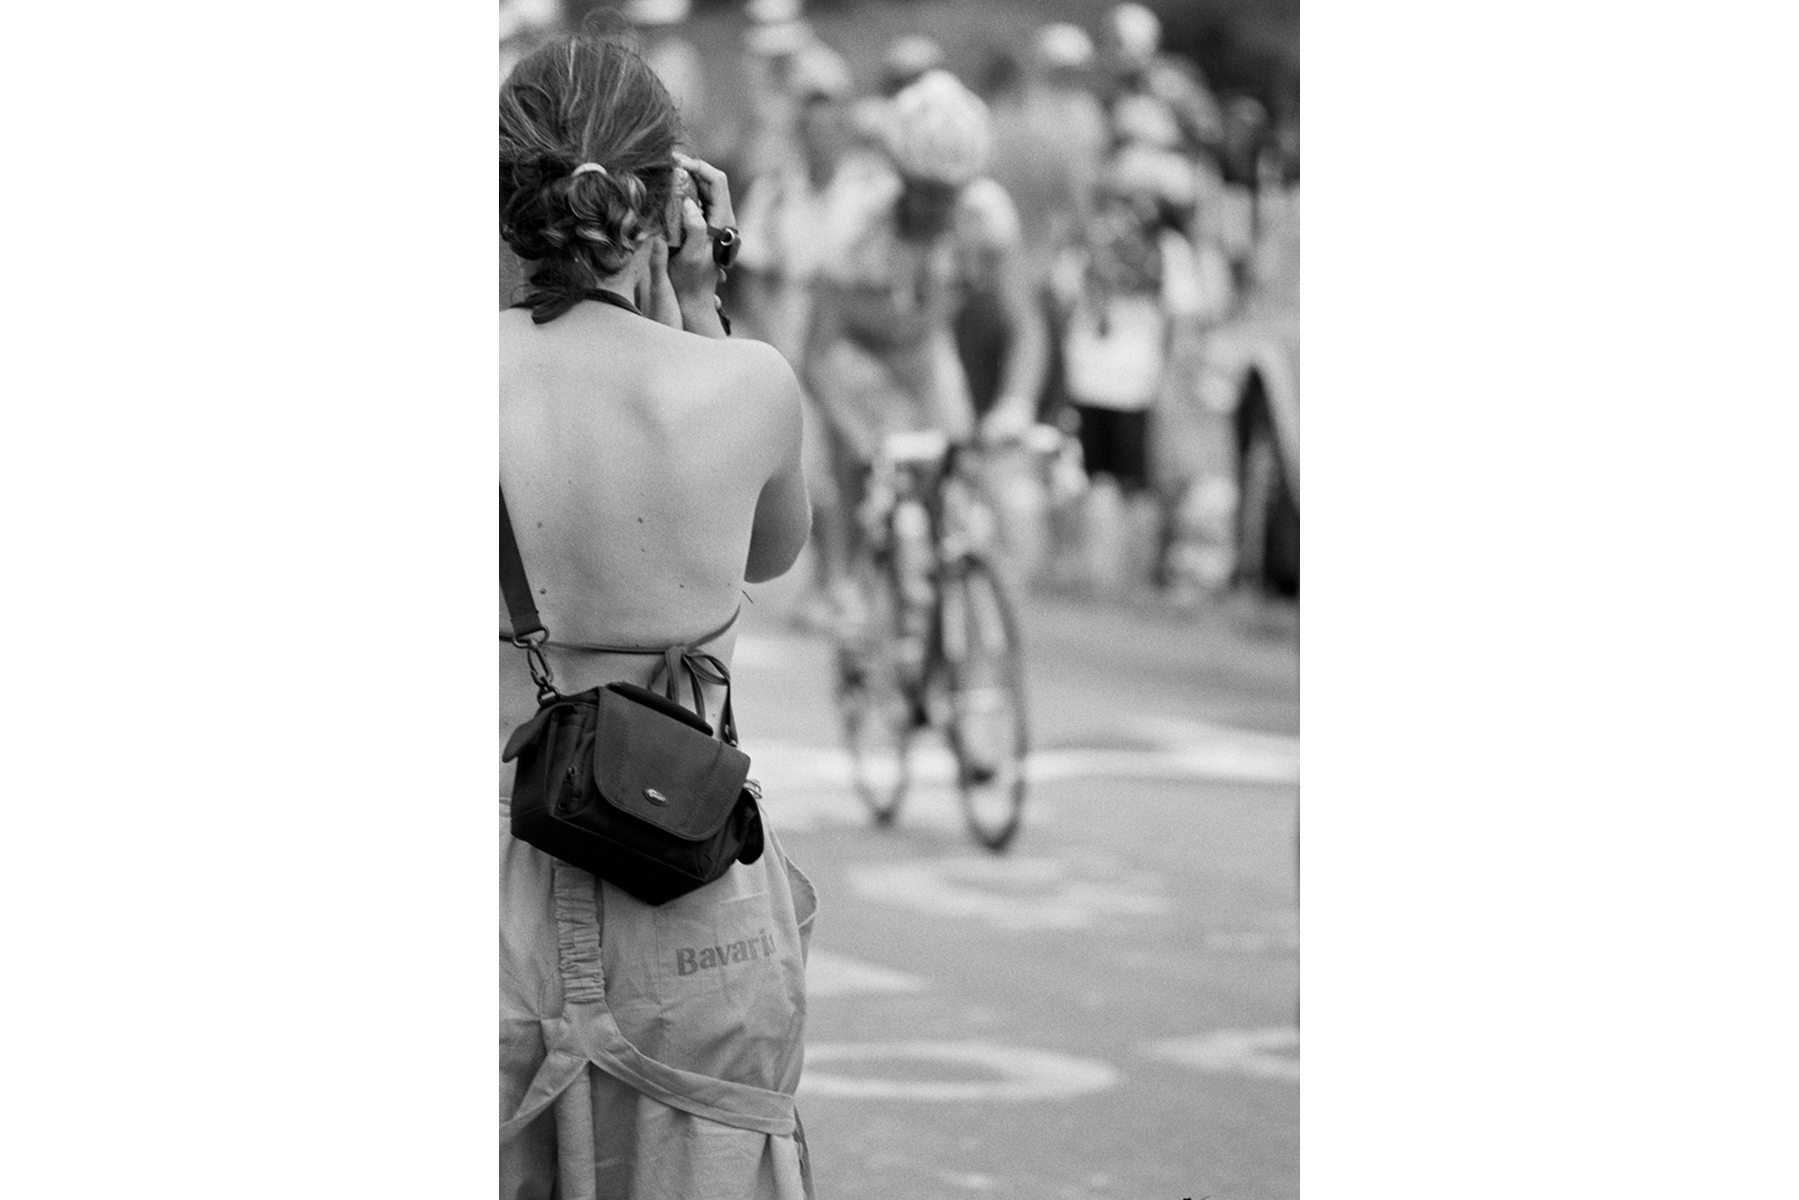 Tour de France 2006 Winning the L'Alpe d'Huez stage has a special meaning for both cyclists and fans. The degree of difficulty of the stage is extraordinary and most of all major stars in cycling have immortalized their name here. L'ascension de l'Alpe d'Huez, en raison de sa grande difficulté, est devenue mythique. La plupart des grands champions ont immortalisé leurs noms par une victoire d'étape à L'Alpe d'Huez. Wegen der Schwere des Anstiegs und aufgrund der Tatsache, dass sich dort mit wenigen Ausnahmen die ganz Großen des Radsports durch ihre Siege verewigt haben, hat ein Etappensieg in L'Alpe d'Huez eine besondere Bedeutung sowohl für die Fahrer – als auch für die Zuschauer. El acenso de L'Alpe d'Huez, a causa de su dificultad y intensidad tiene un significado muy simbólico. Las grandes estrellas del ciclismo, con algunas excepciones, han inmortalizado su nombre en esta subida.